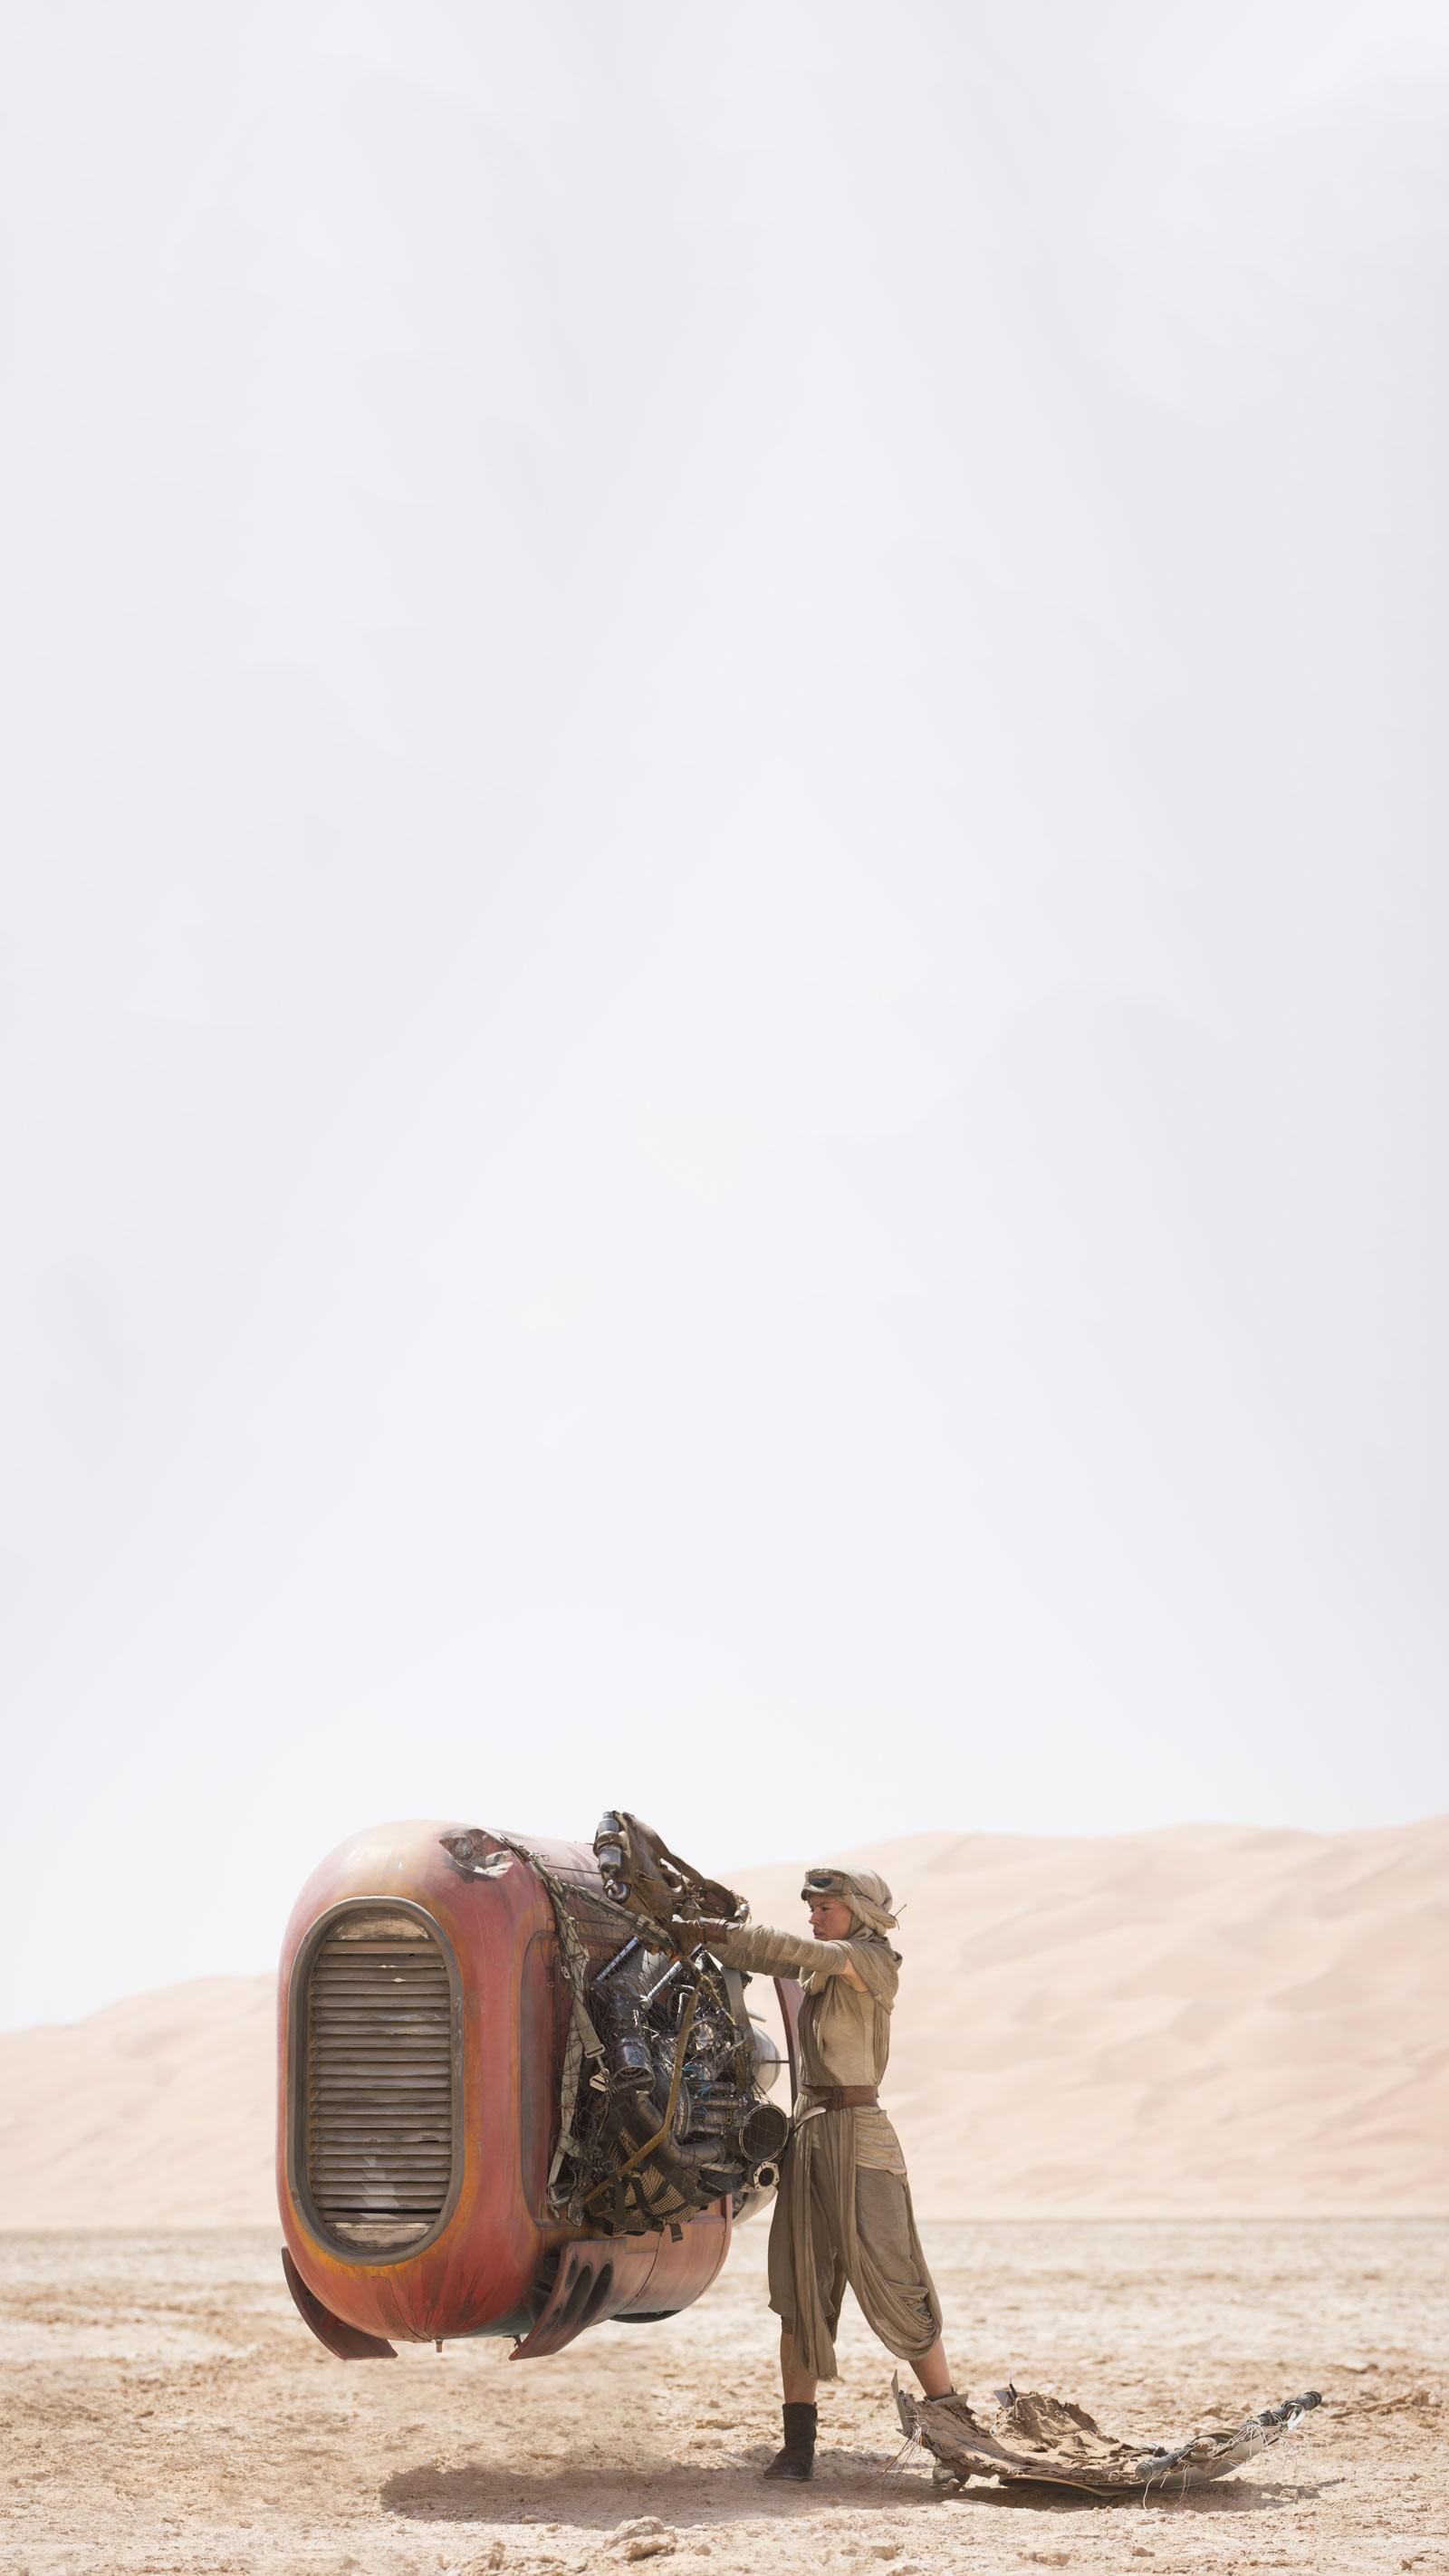 Pin on Rey Star Wars Cosplay